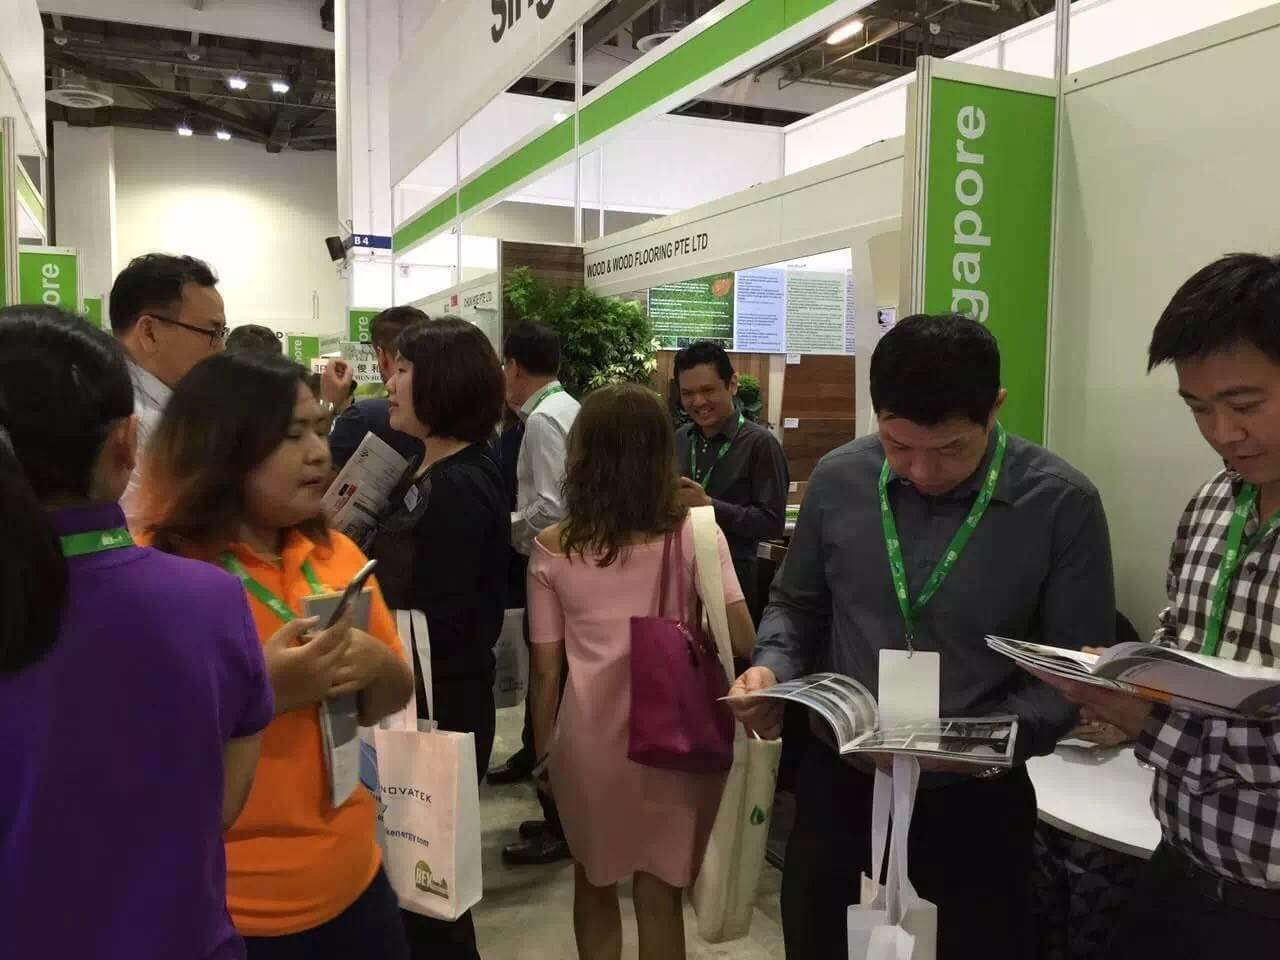 BEX Asia 2016 Green Building Exhibition (7 SEP - 9 SEP 2016)